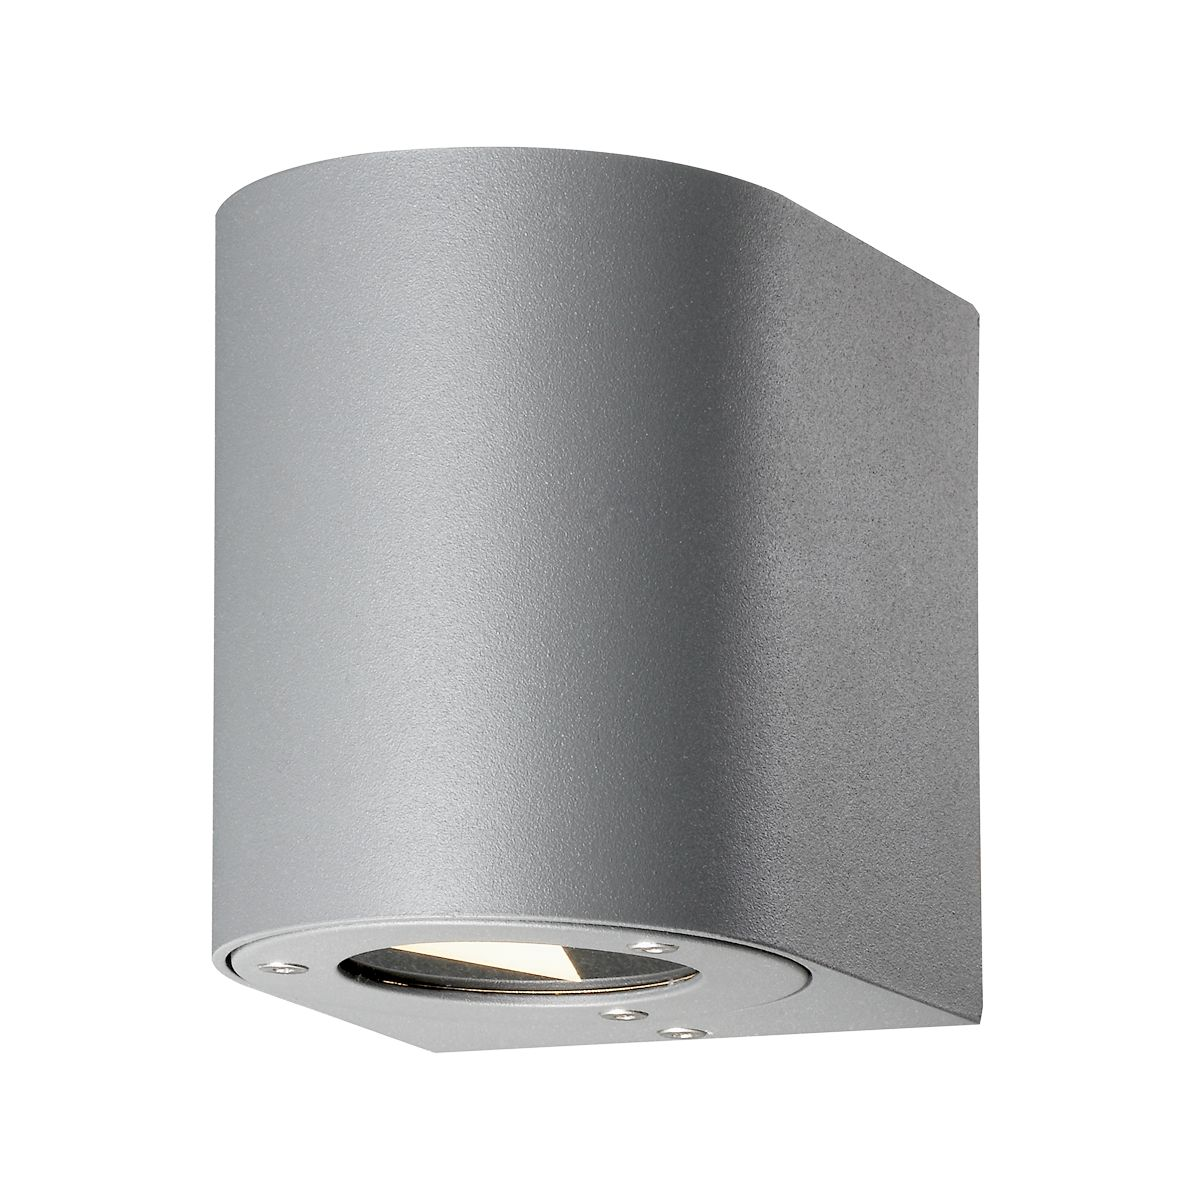 LED-Außenleuchte Canto ● Aluminium Grau ● 2-flammig- Nordlux A+